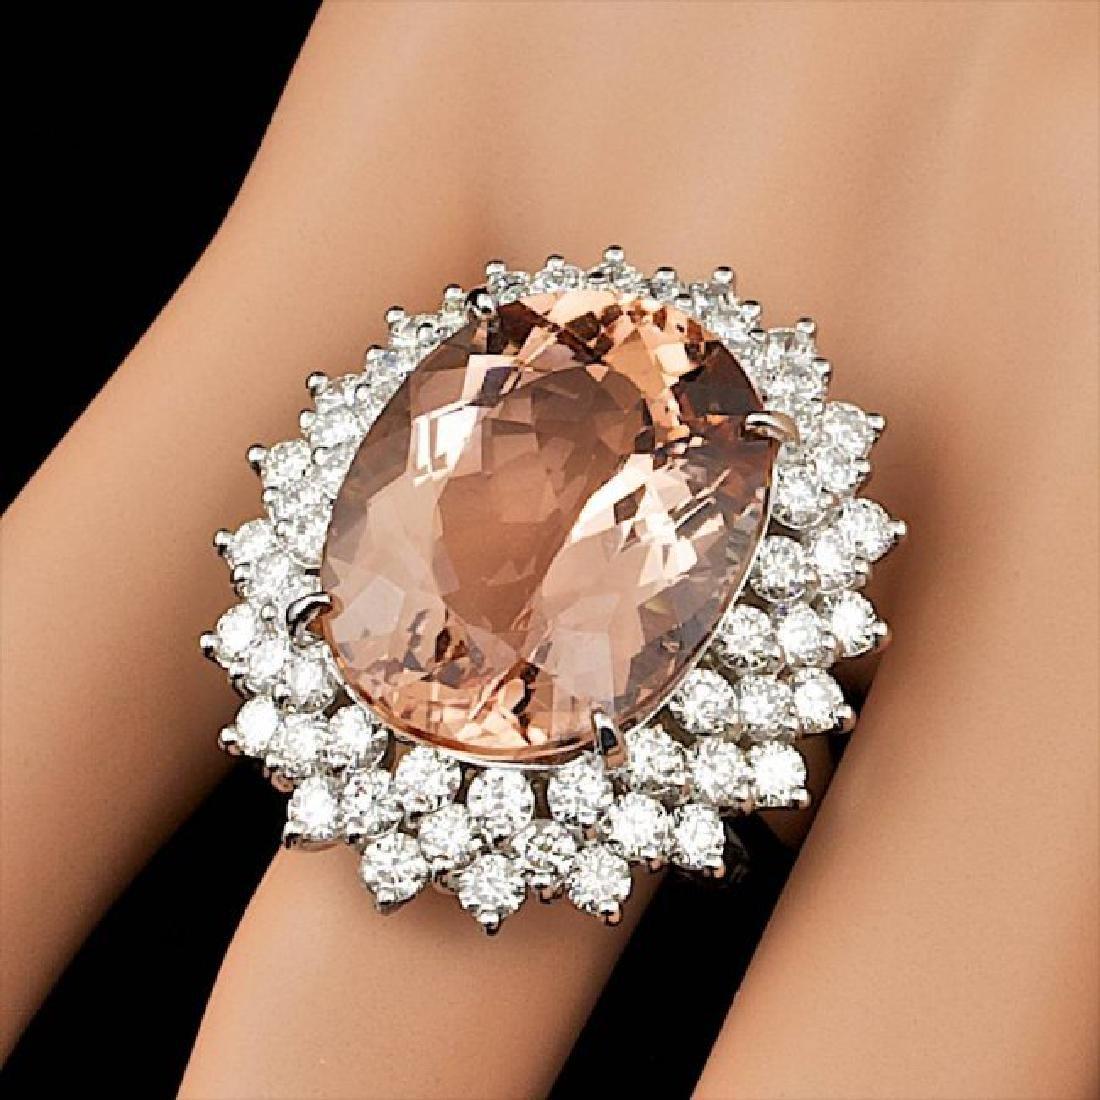 14k Gold 21.00ct Morganite 4.00ct Diamond Ring - 5